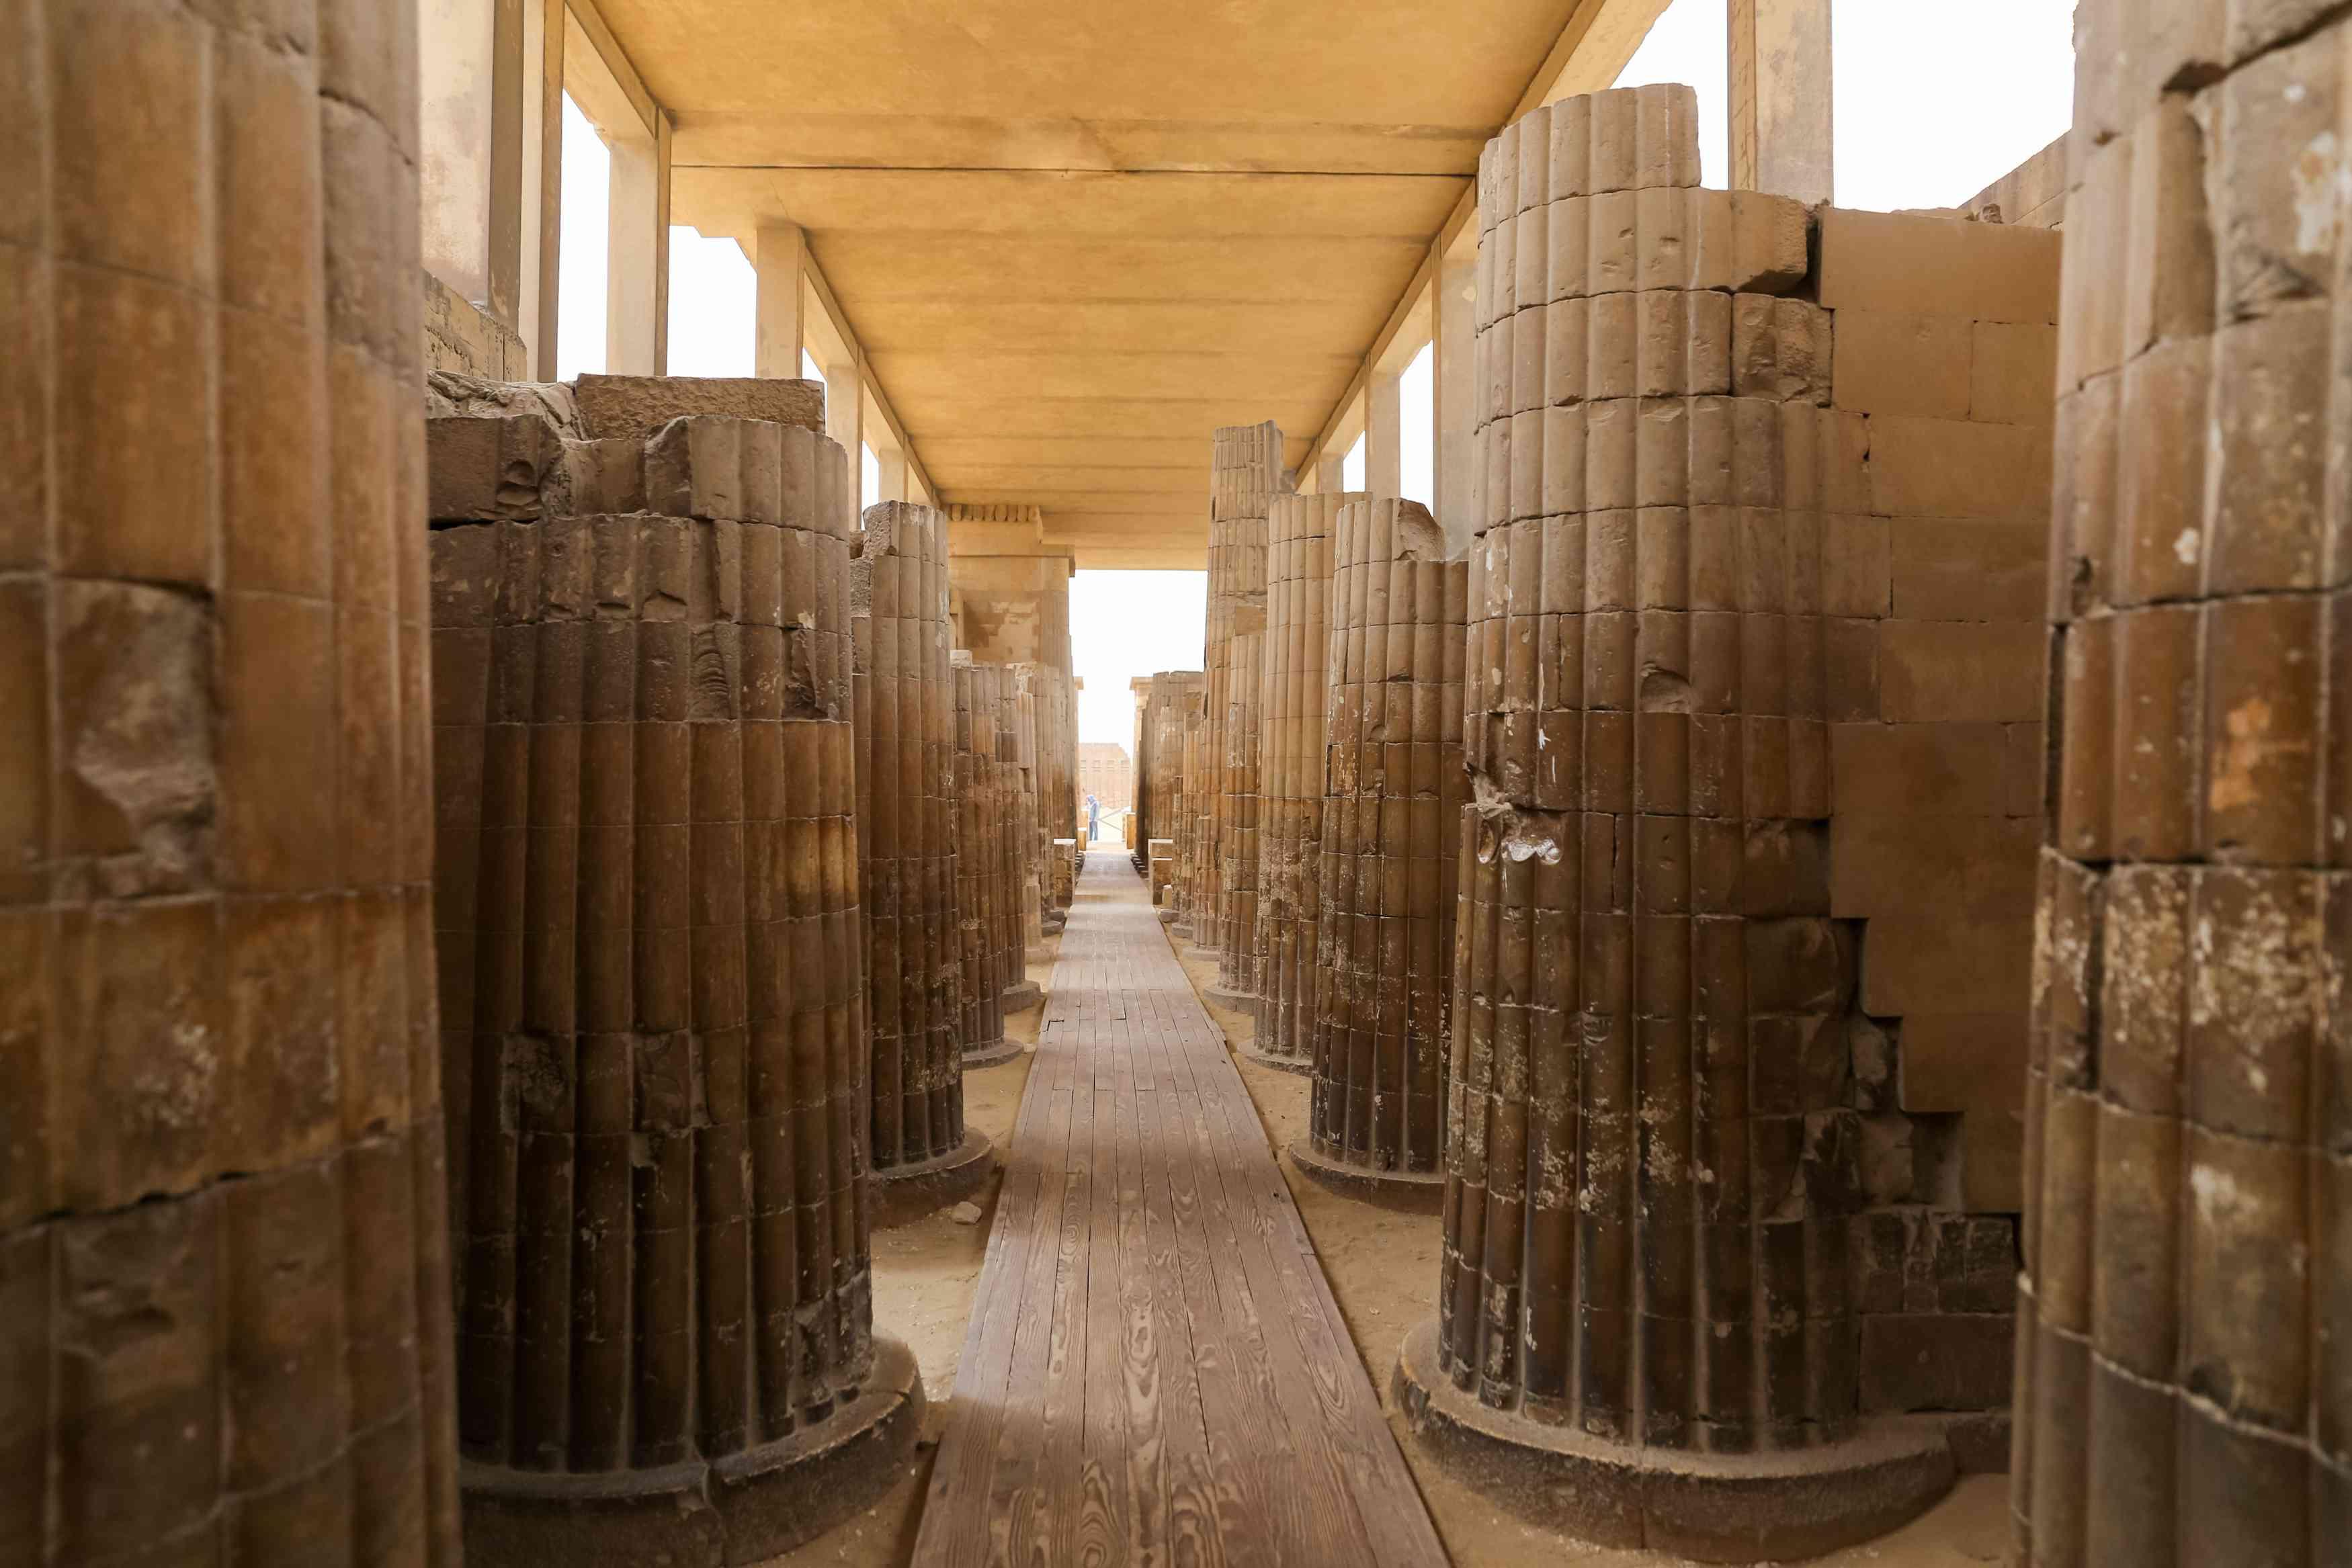 Interior of Old Kingdom Funerary Complex at Saqqara